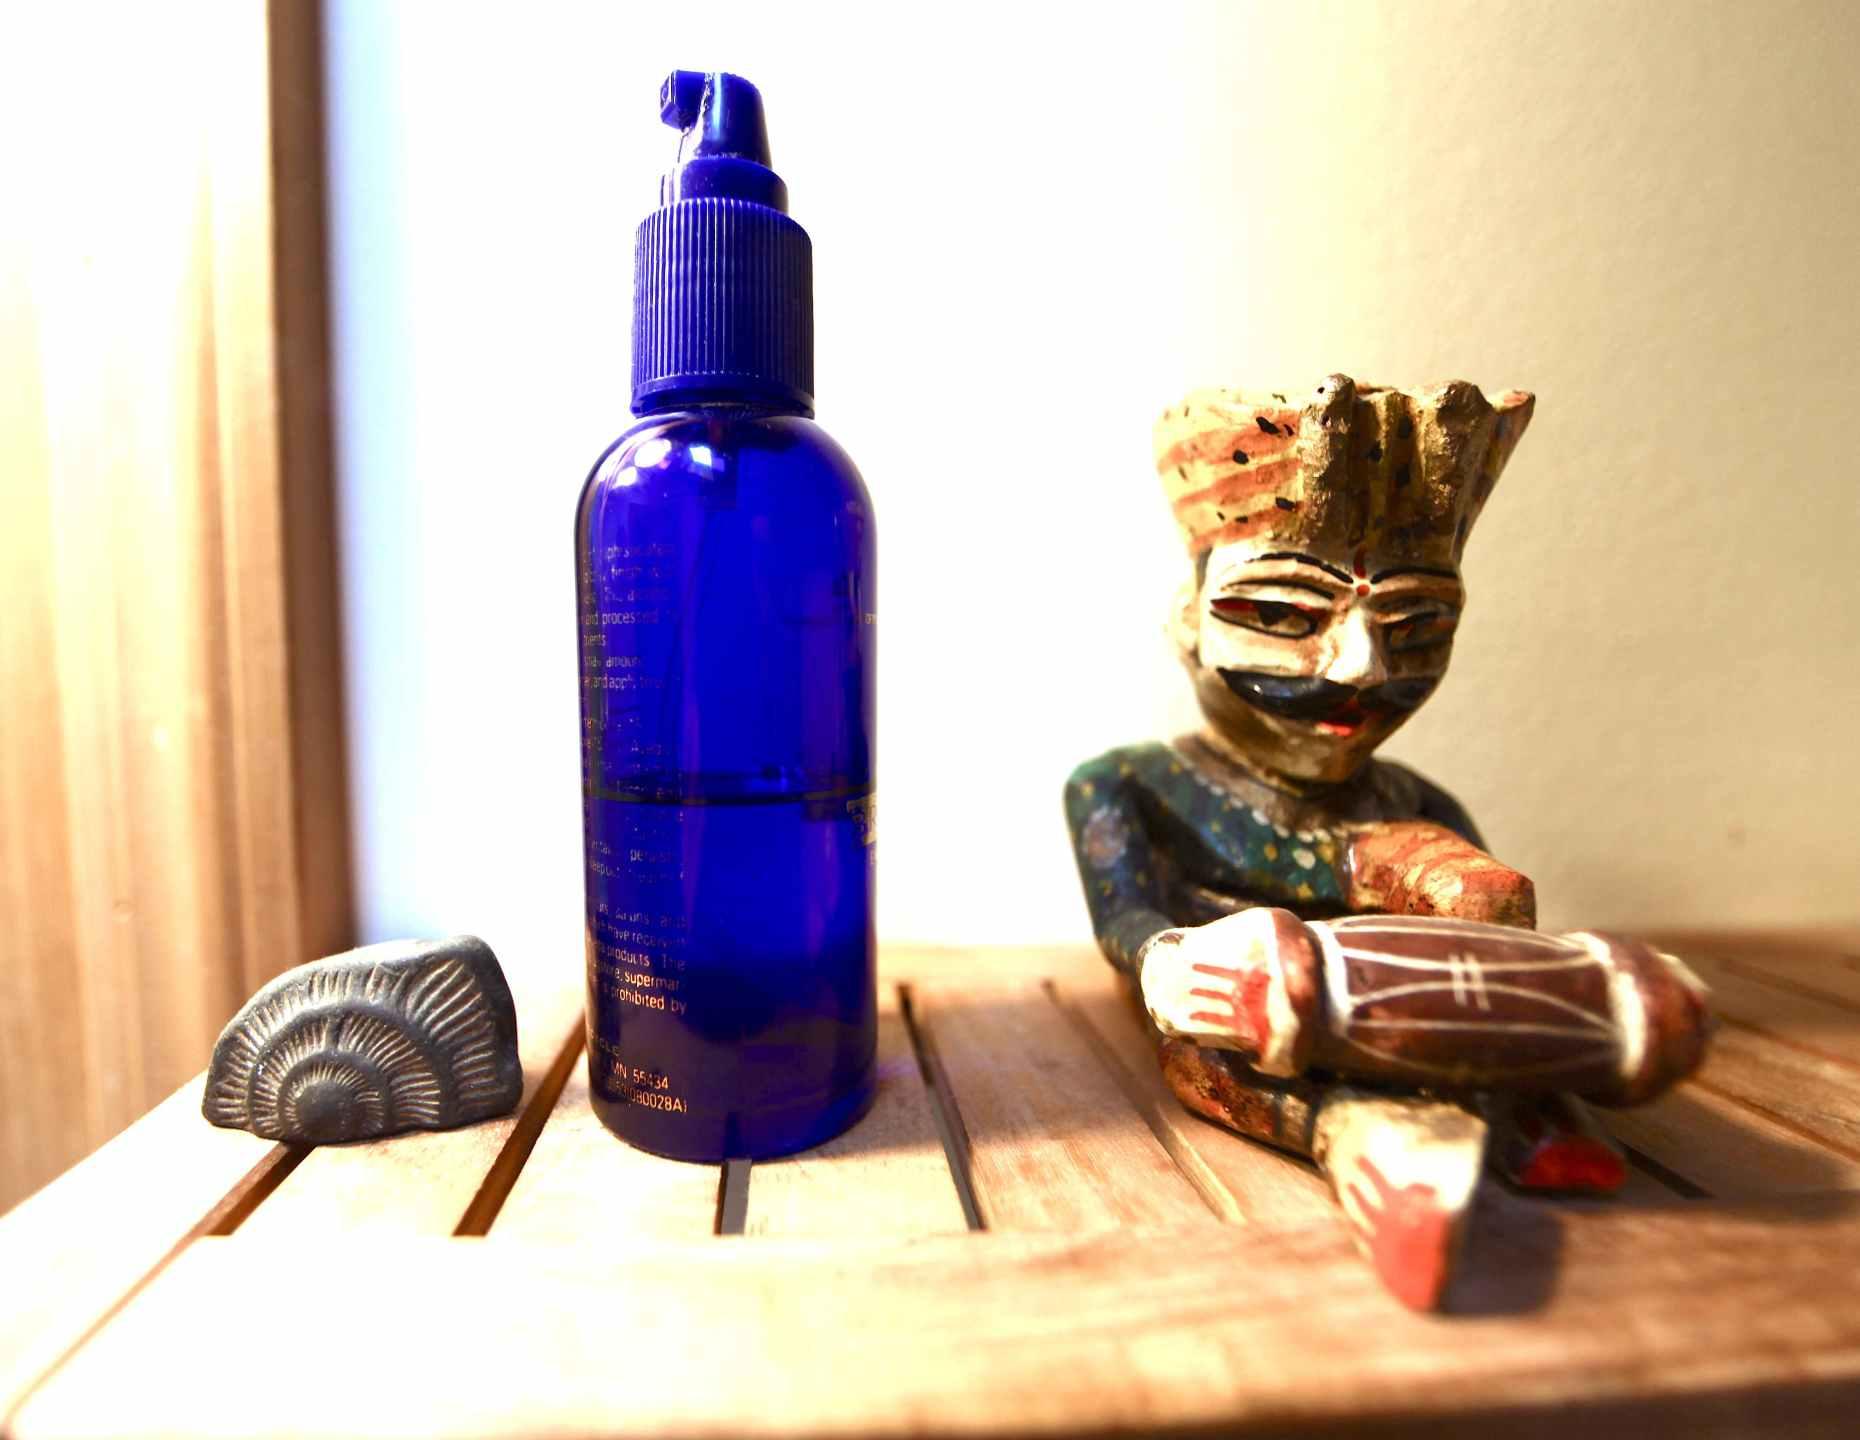 Our detangler bottle is an old Aveda bottle. Photo © Liesl Clark